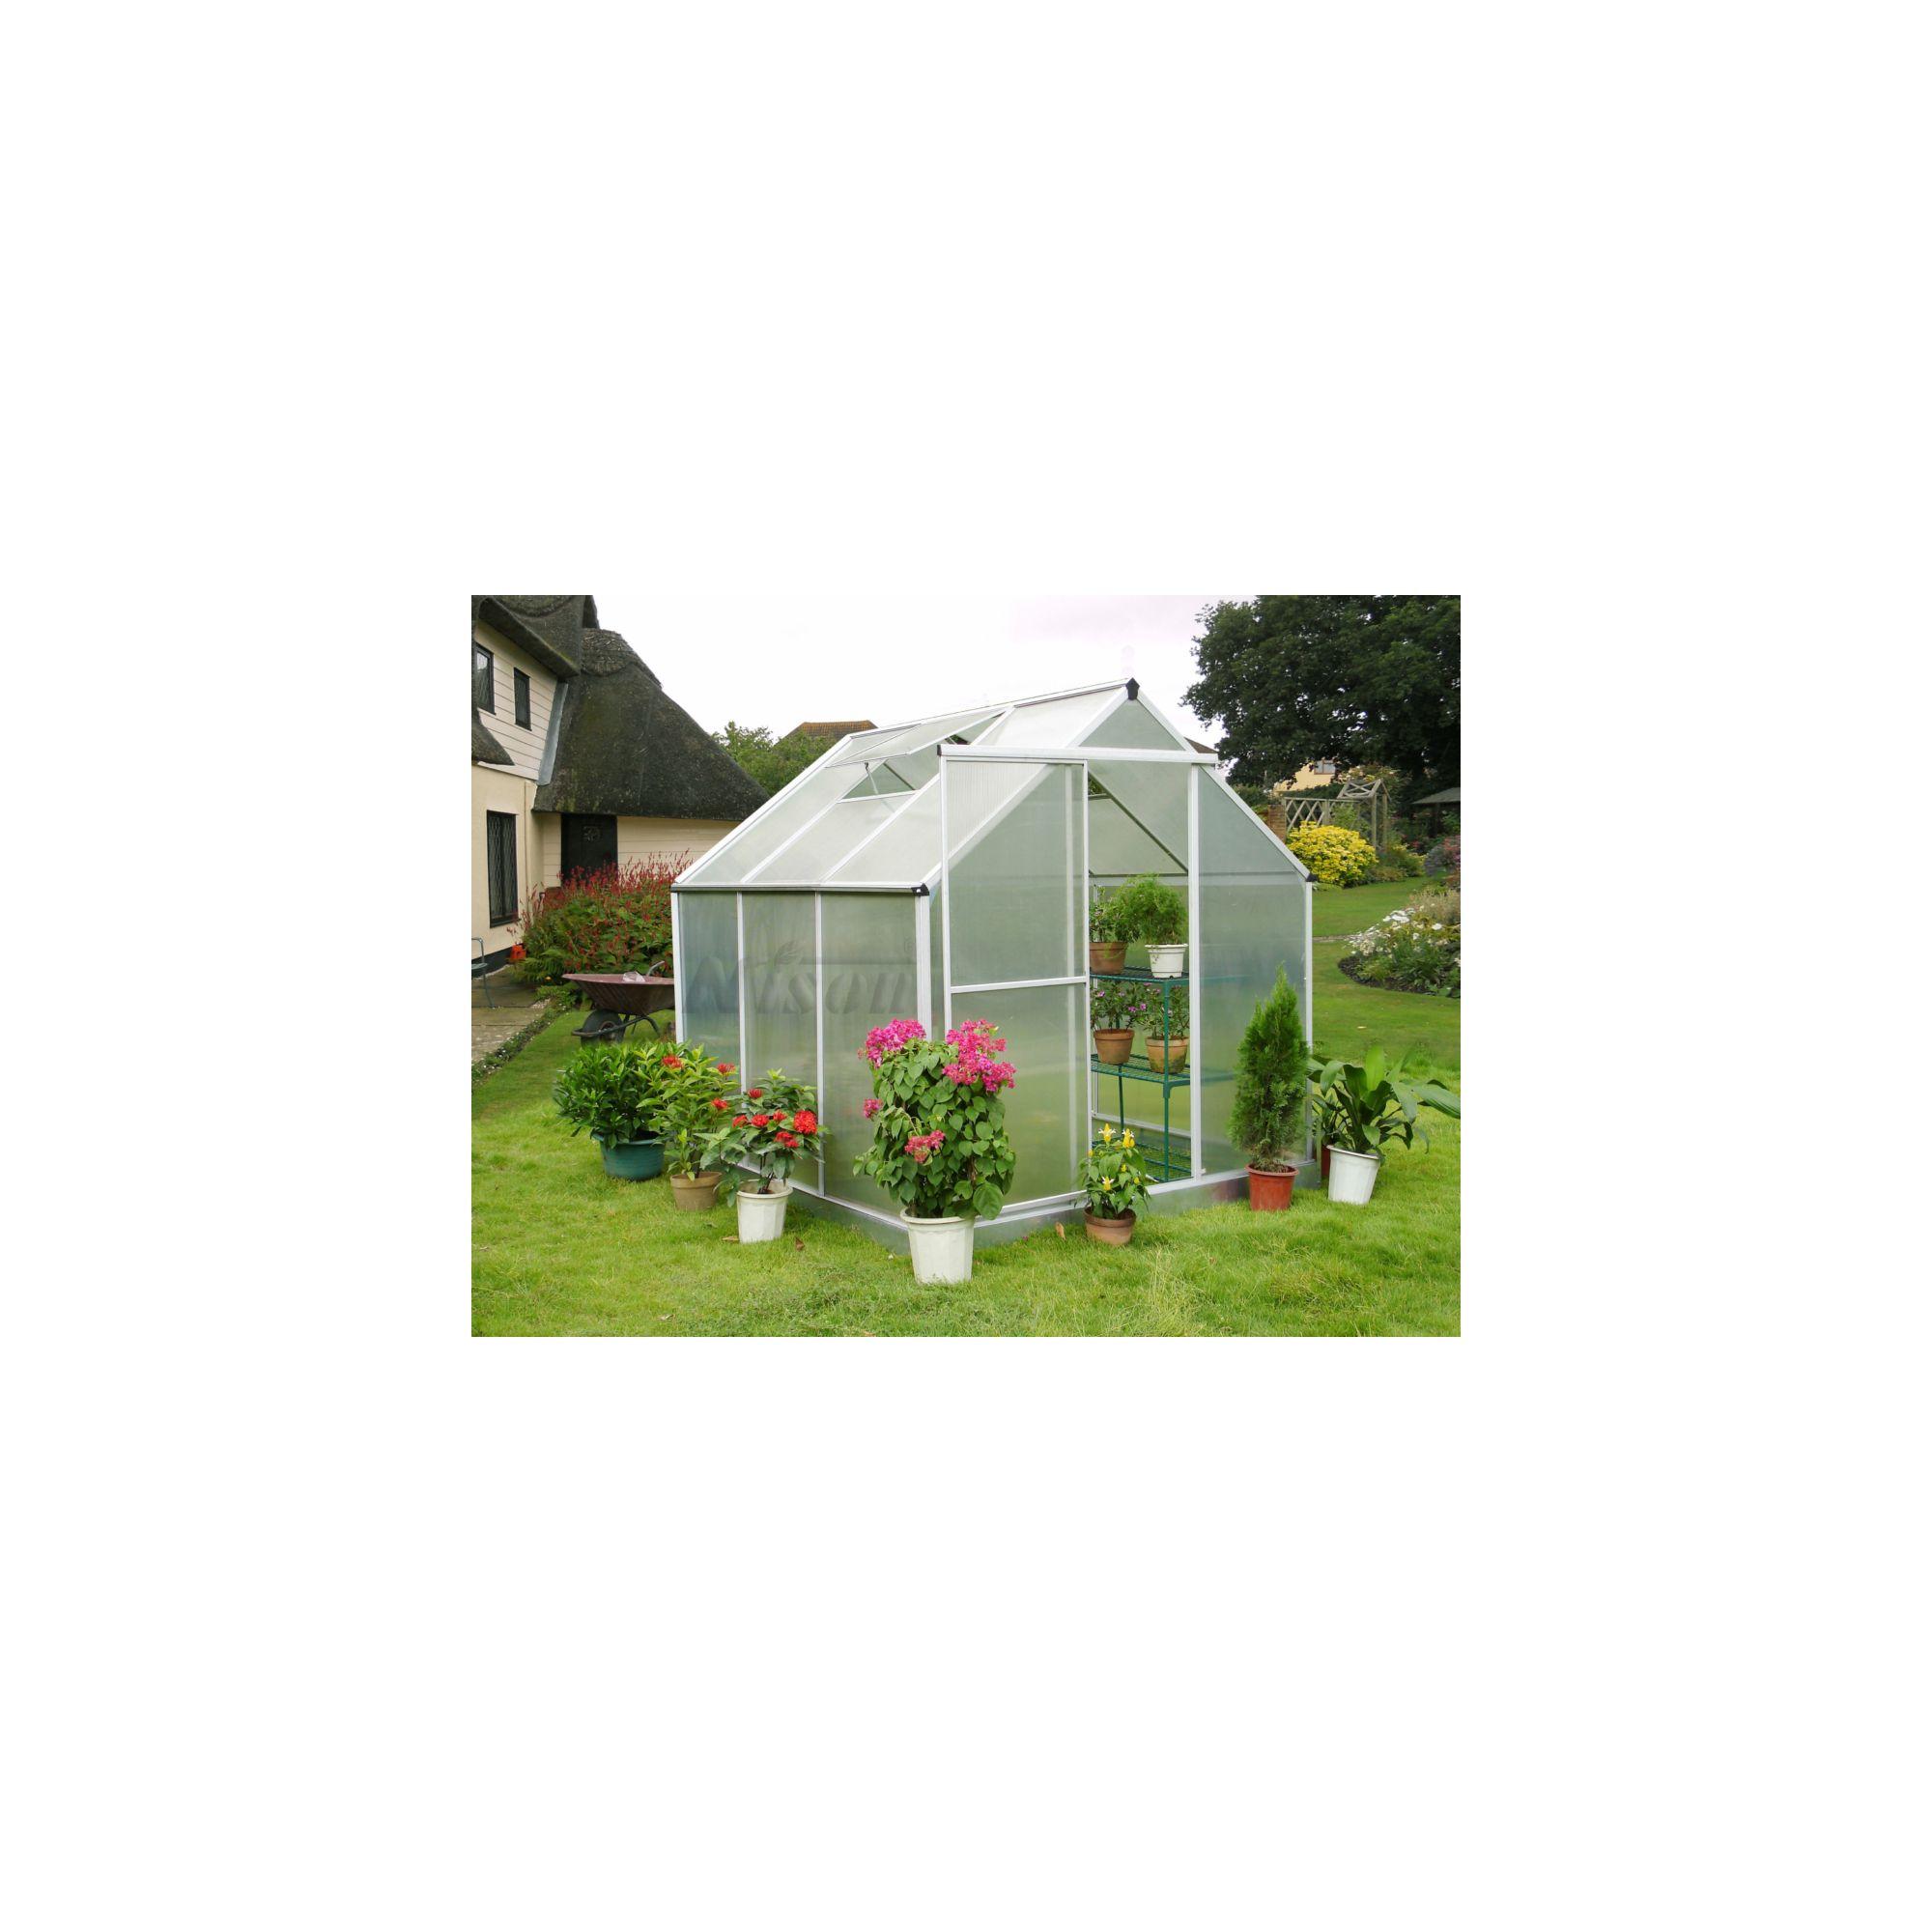 Nison Aquila 6x6 Aluminium Polycarbonate Greenhouse, Including Base & Free Shelving at Tesco Direct